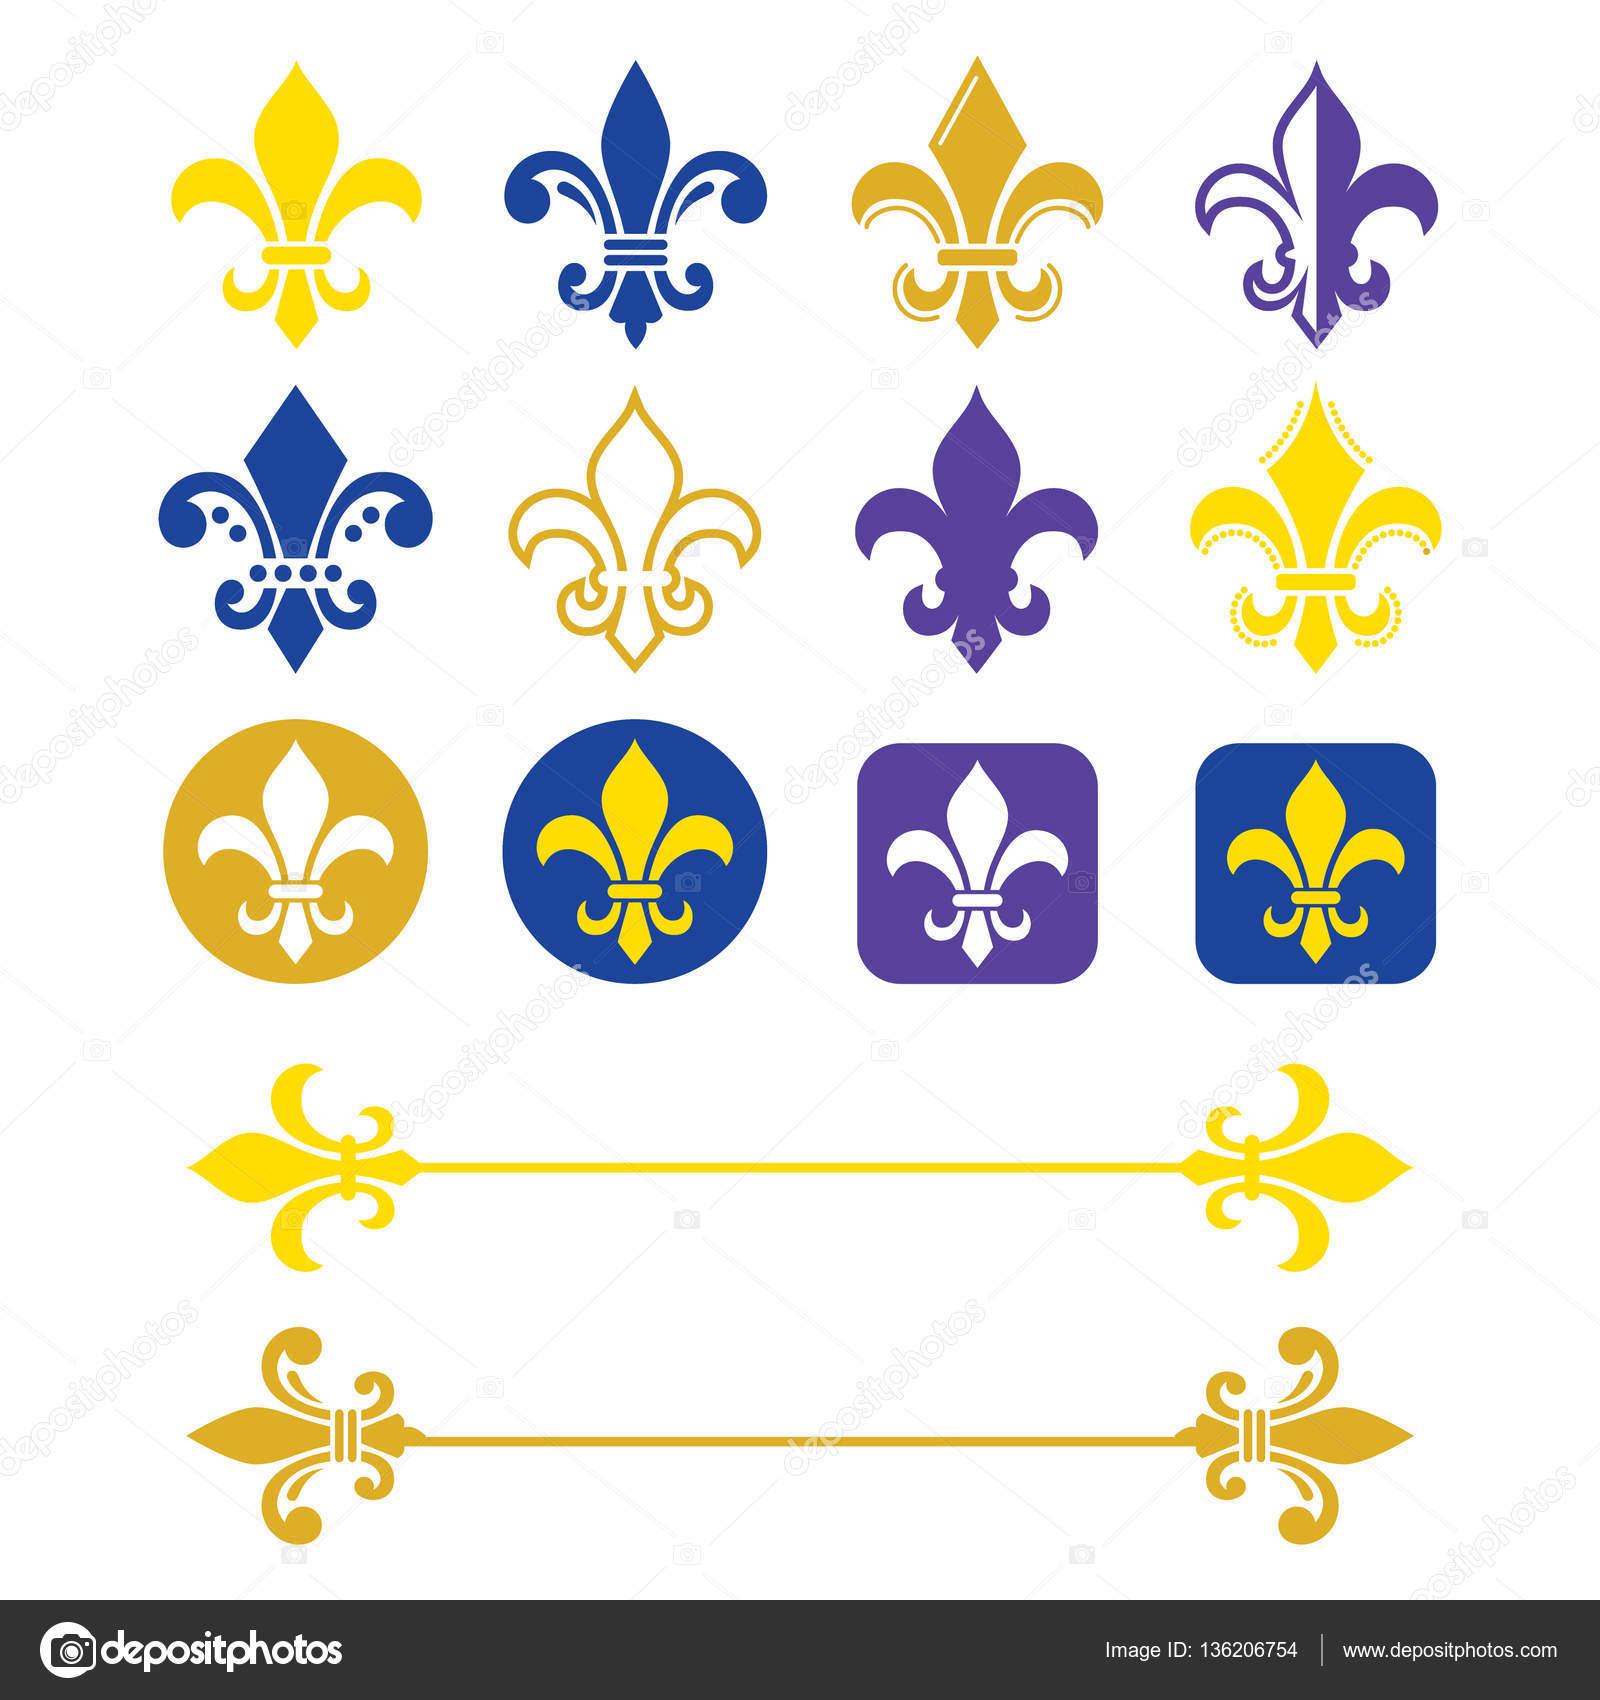 Fleur de lis french symbol gold and navy blue design scouting fleur de lis french symbol gold and navy blue design scouting organizations french biocorpaavc